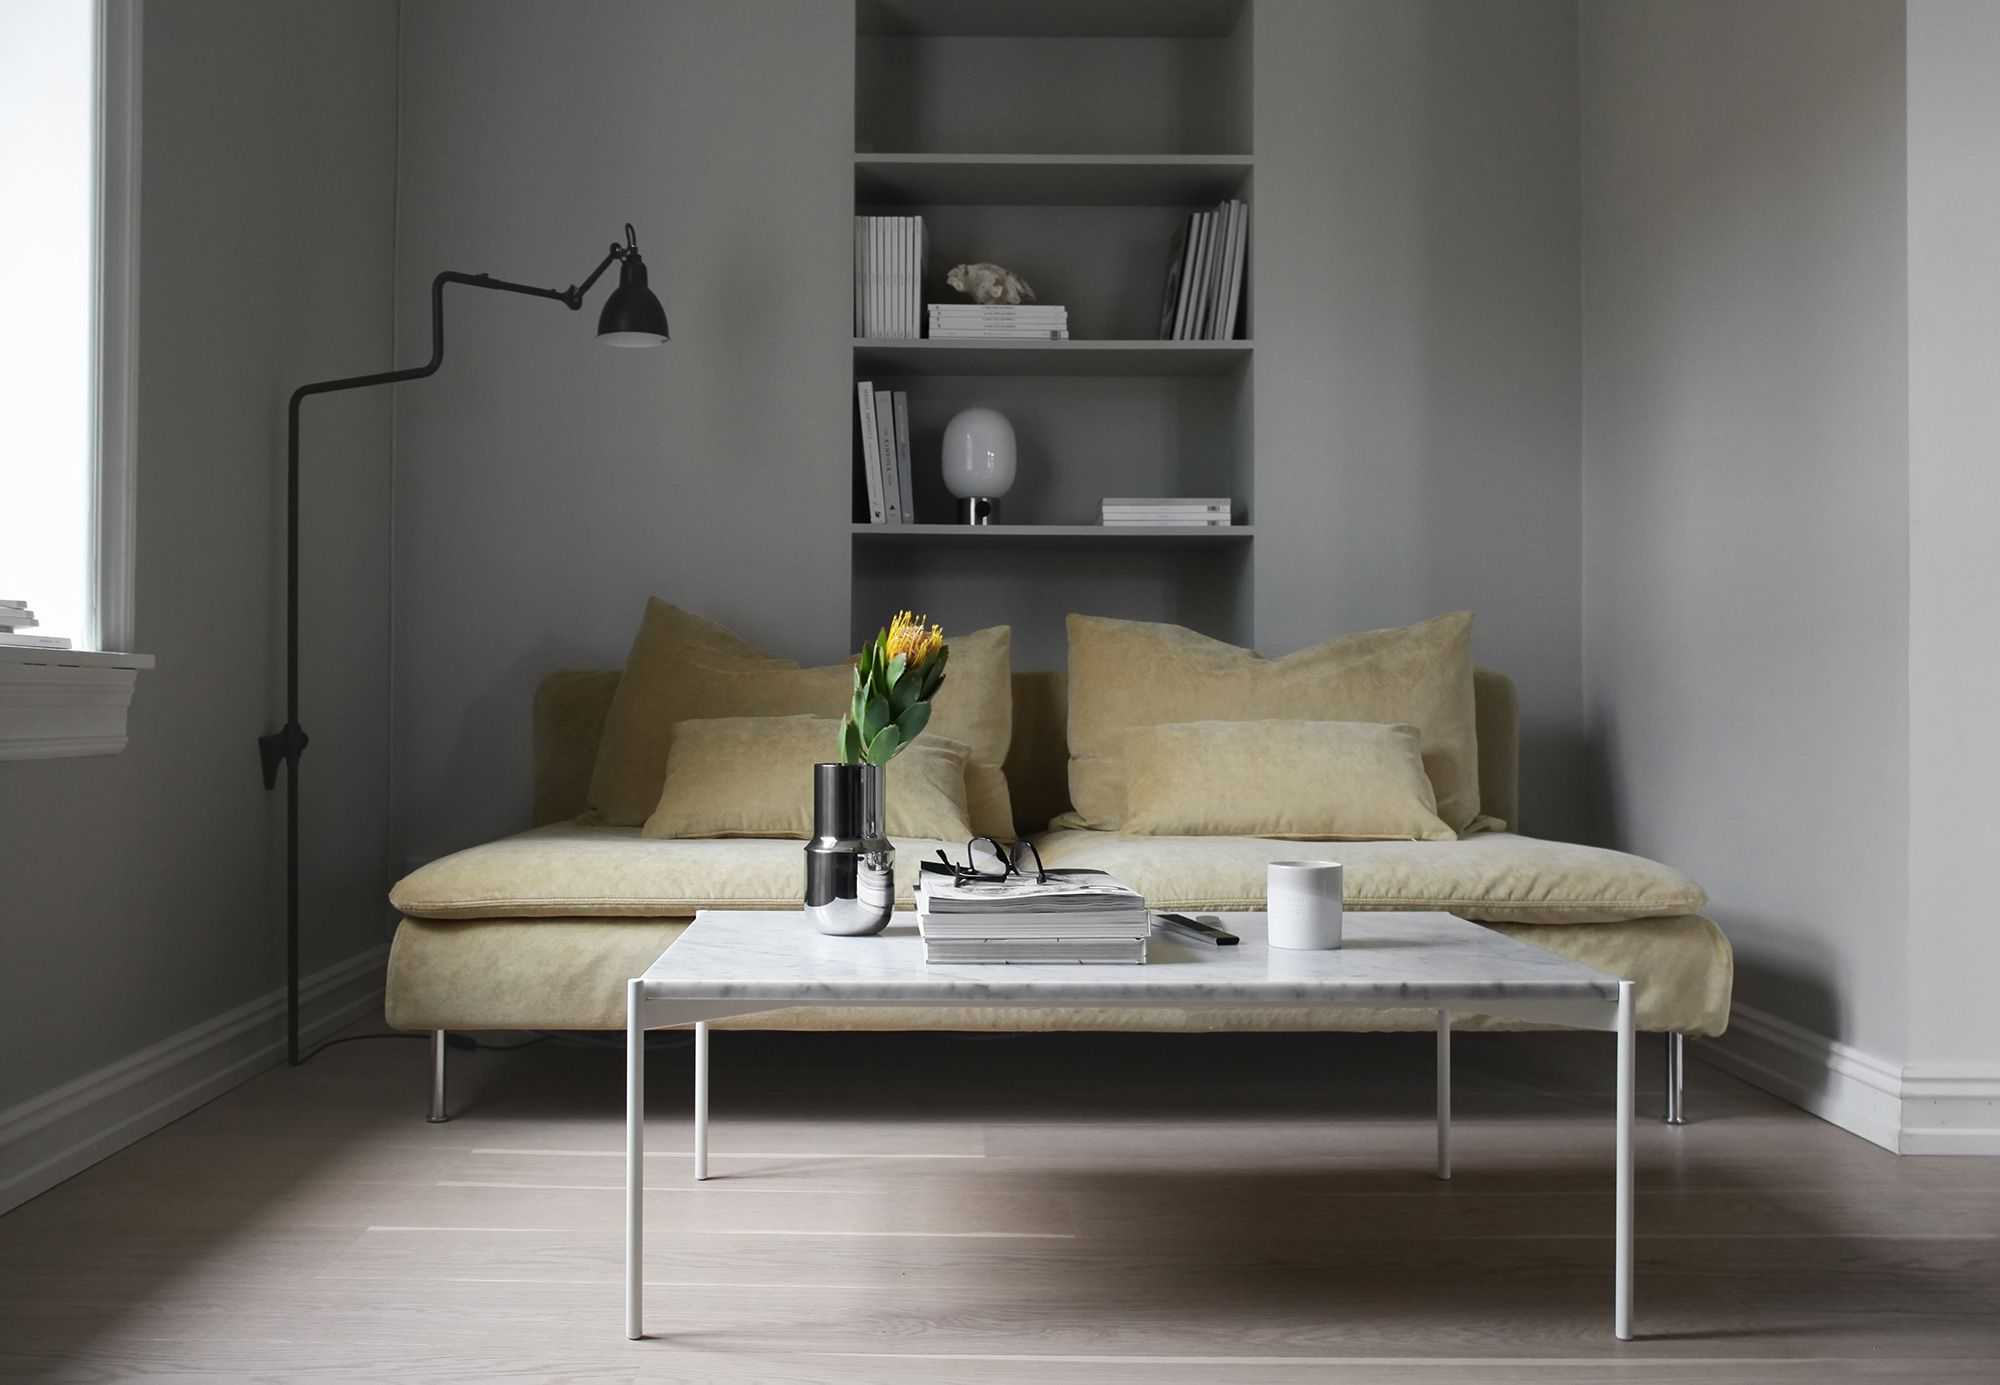 Minimal Scandinavian Living Room With A Mustard Yellow Velvet Sofa Modern Minimalsim Gra Yellow Living Room Minimalist Living Room Living Room Scandinavian